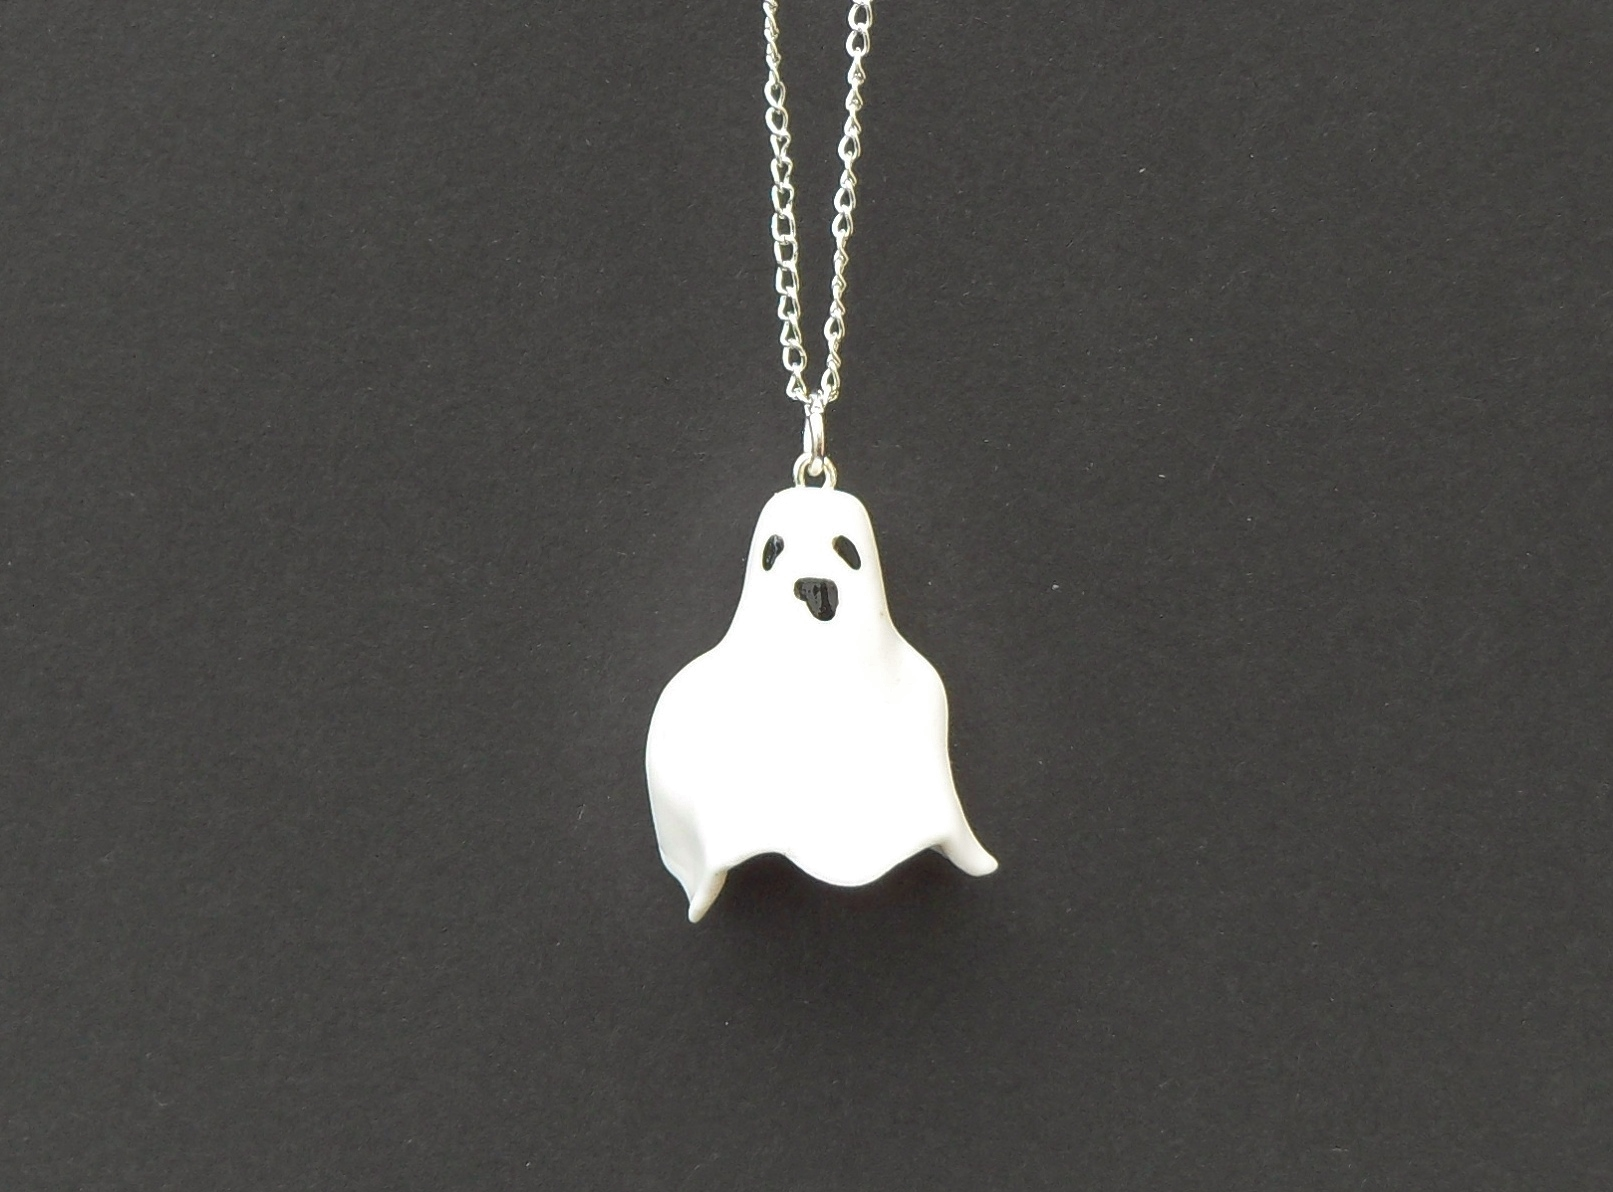 Halloween, spooky, creepy, cute, trick or treat, horror, handmade, novelty, season, kitsch, fan, jewellery, accessories, quirky, spooks, ghost, charm, necklace,